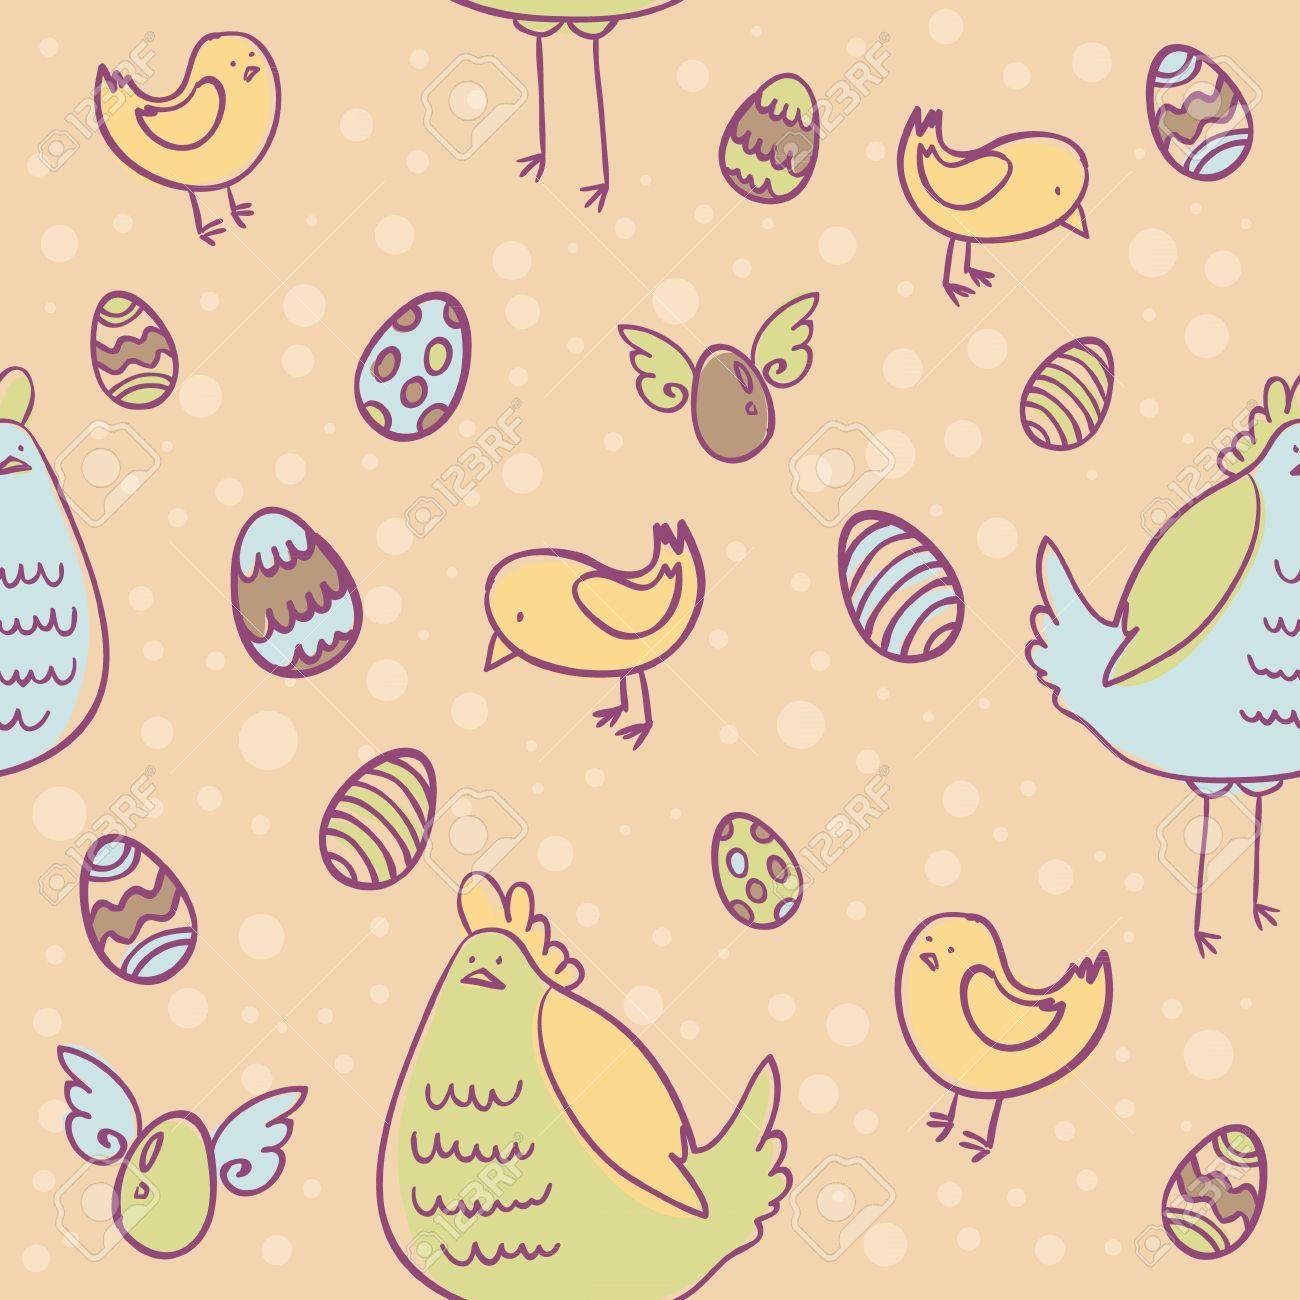 Easter Eggs Hen And Chicken Cartoon Hand Drawn Seamless Texture